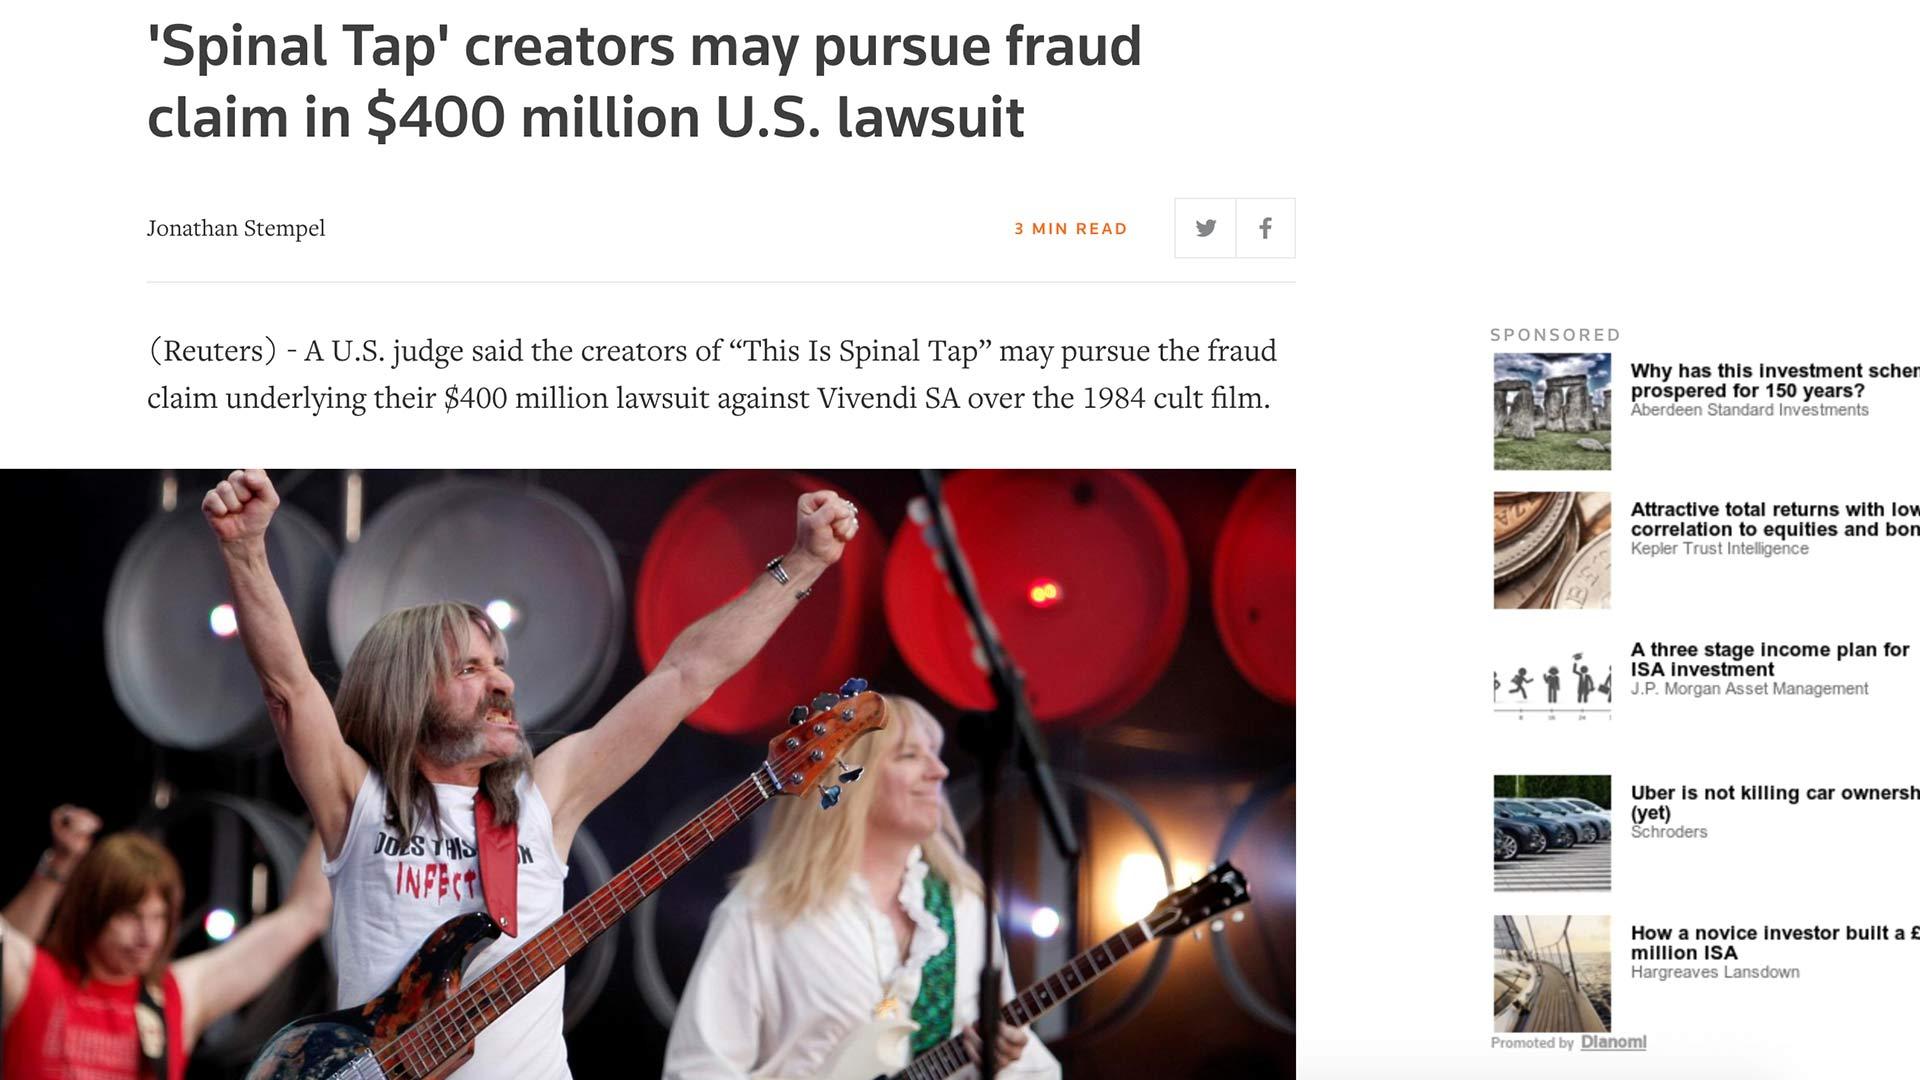 Fairness Rocks News 'Spinal Tap' creators may pursue fraud claim in $400 million U.S. lawsuit